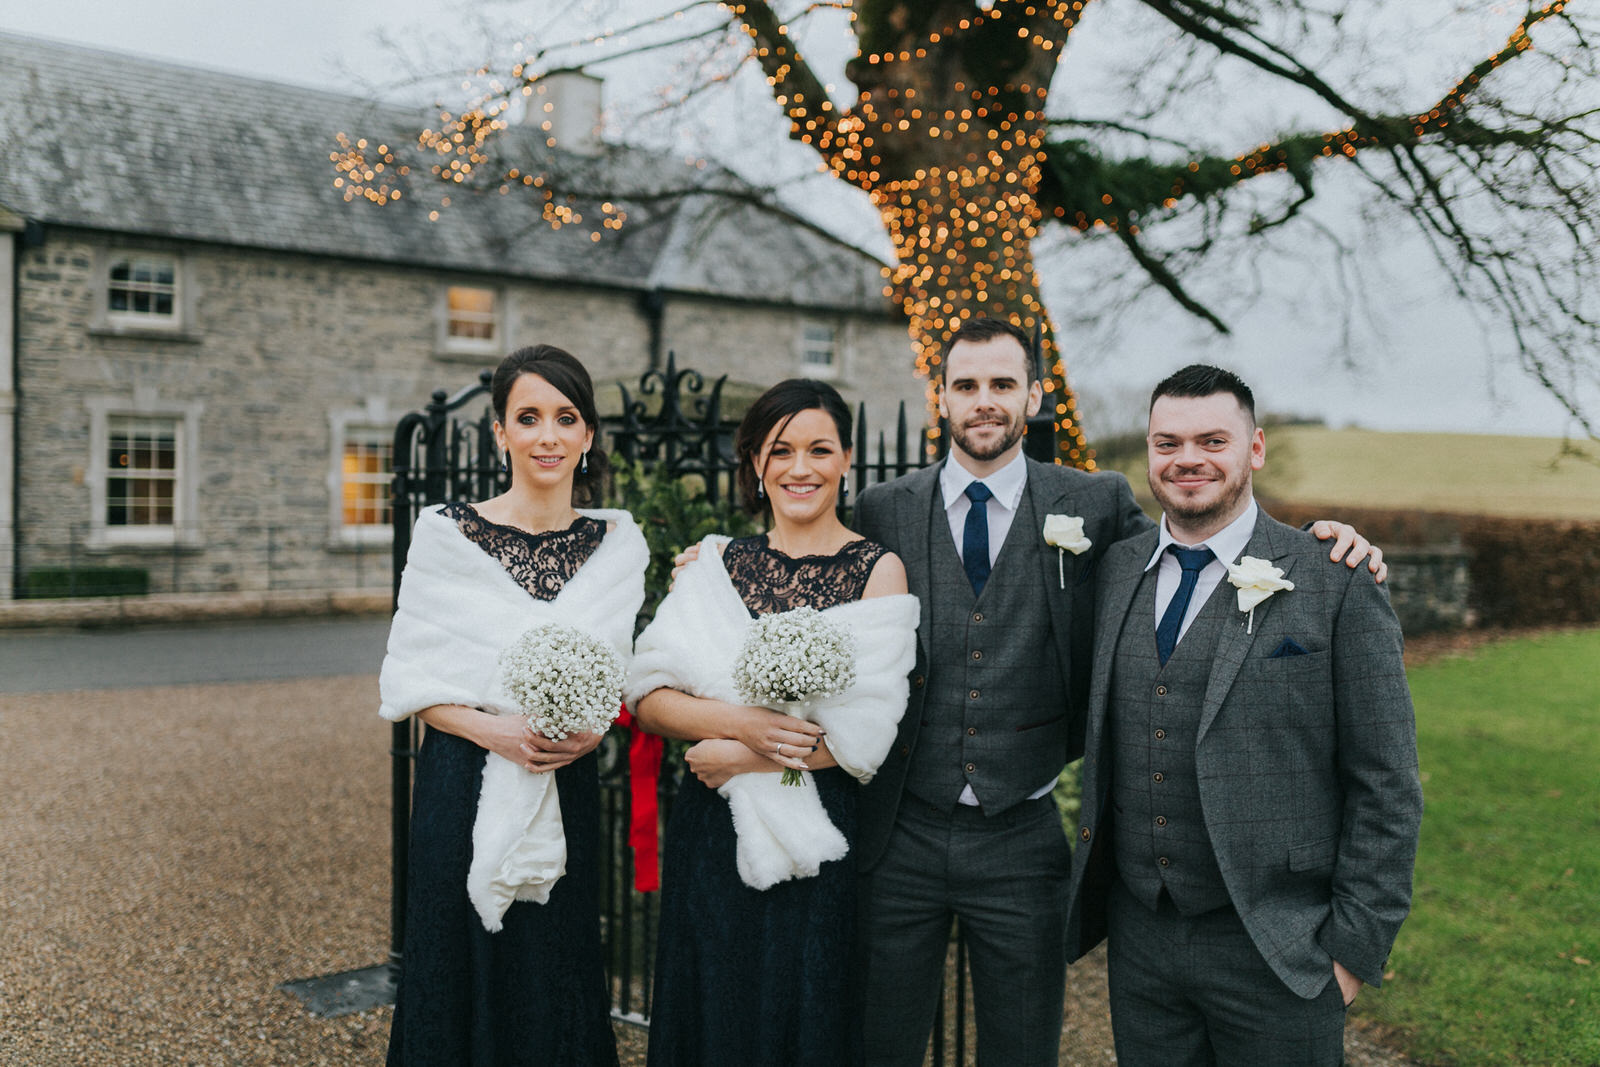 Clonabreany_wedding-photographer_roger_kenny_ireland_069.jpg